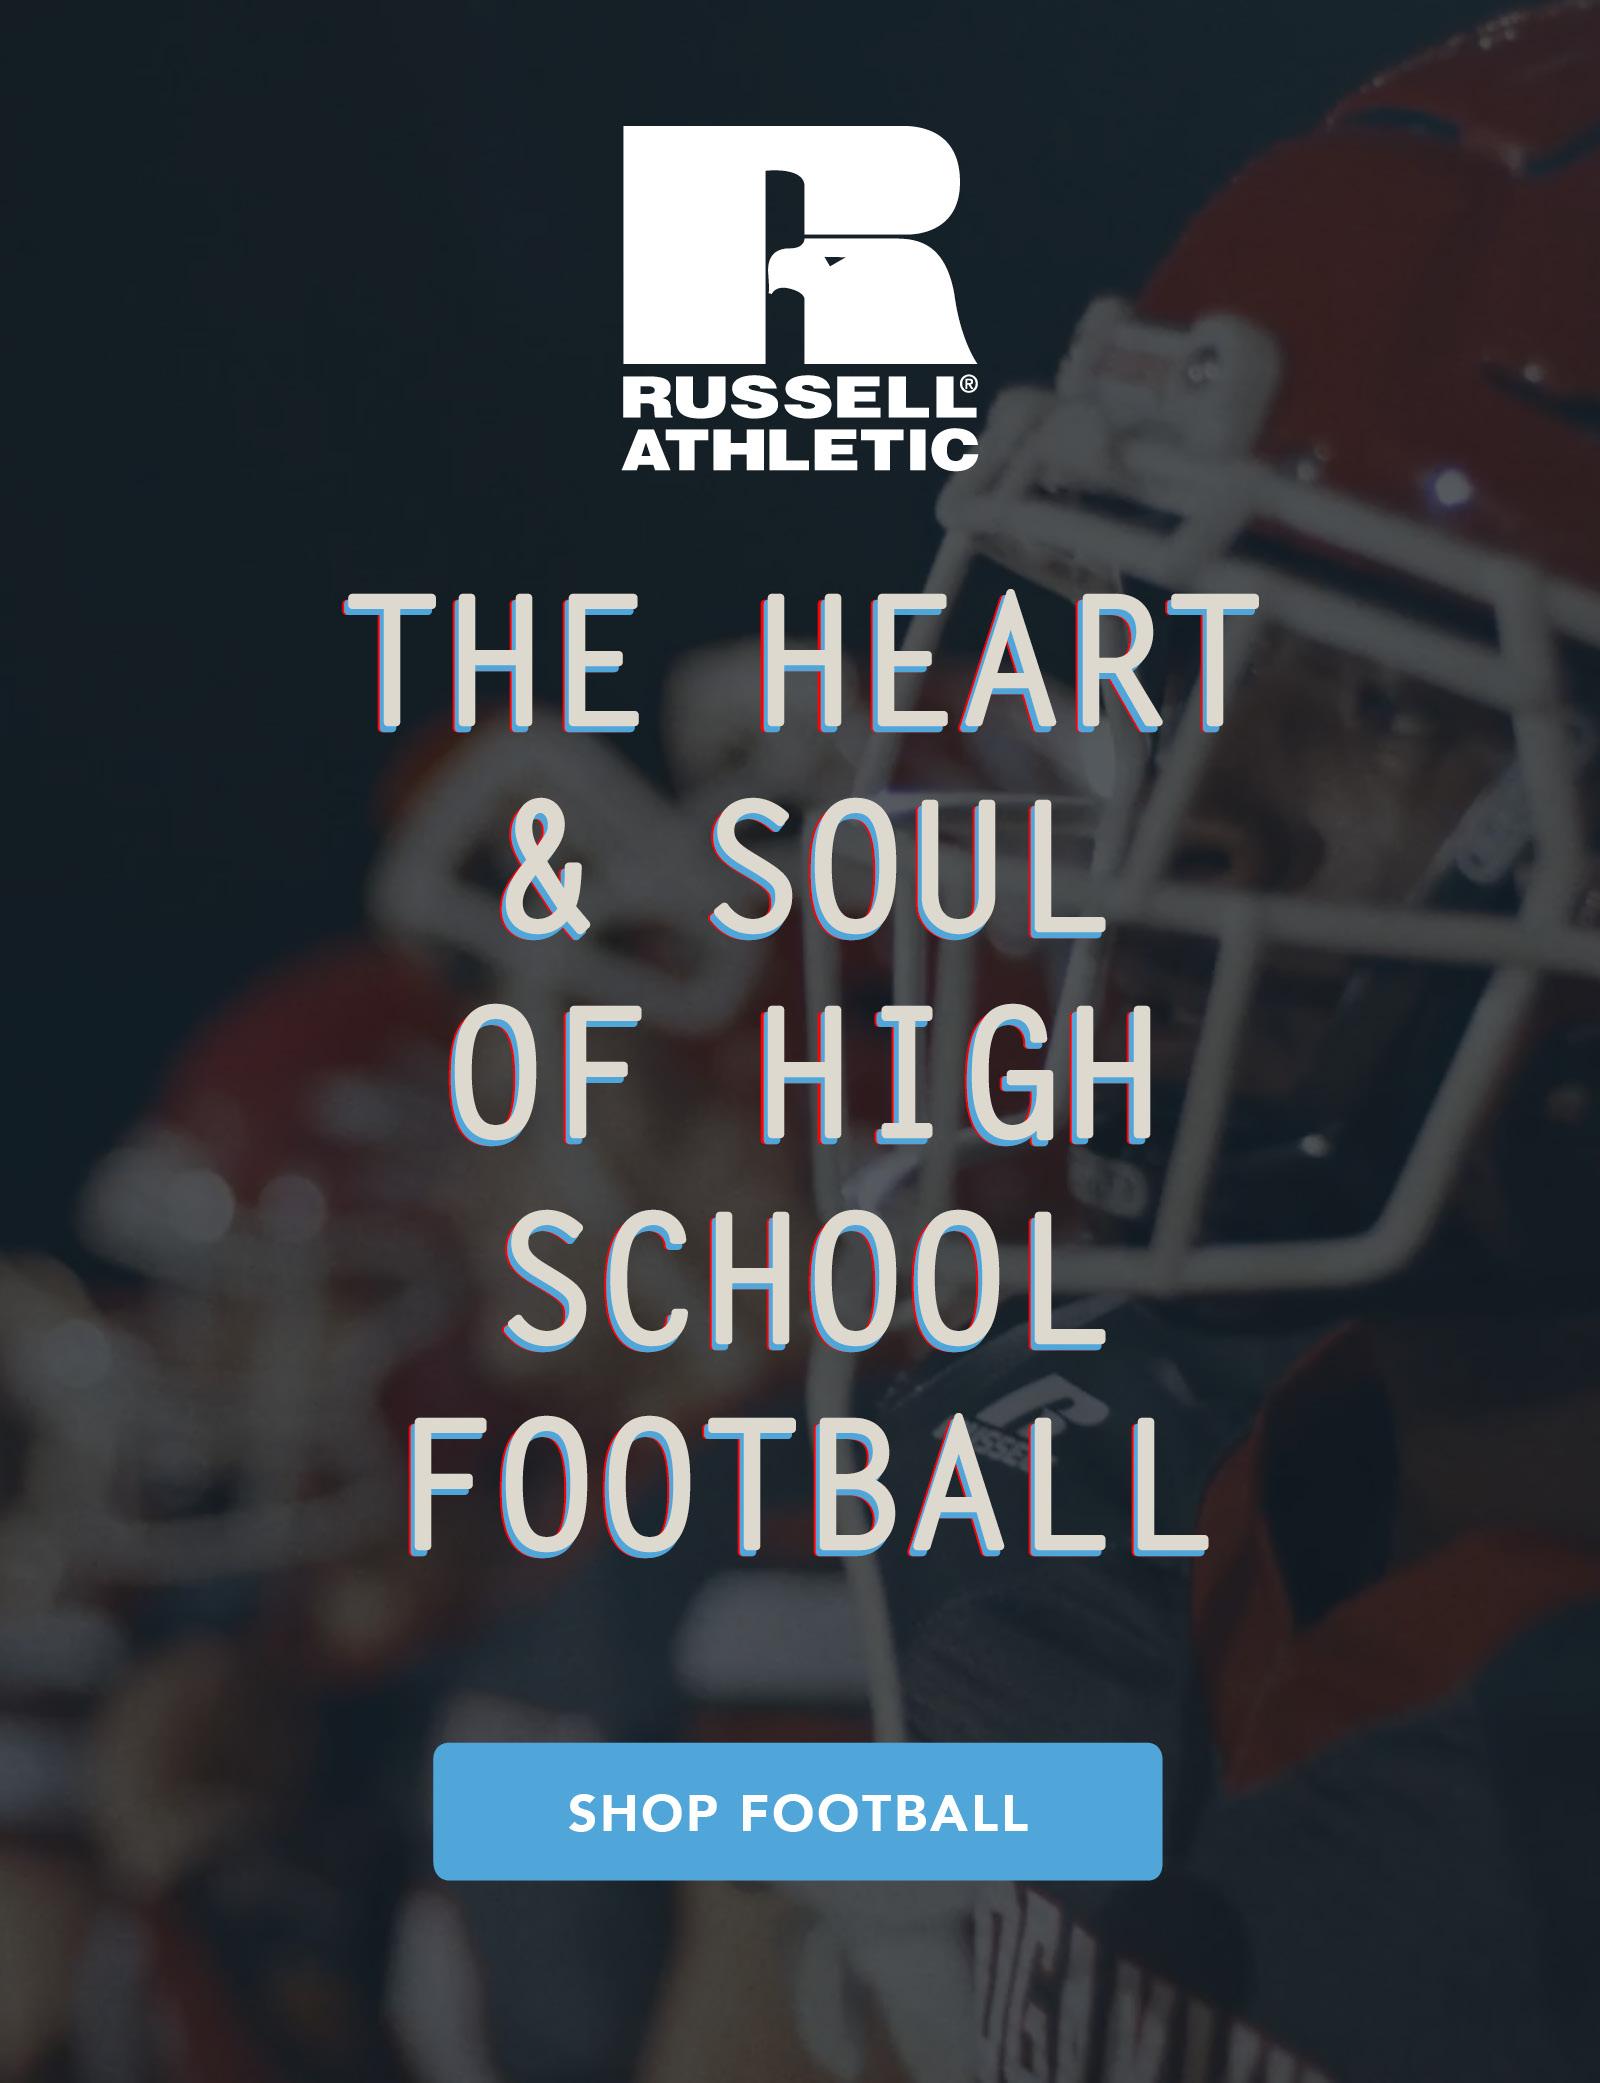 Shop Football